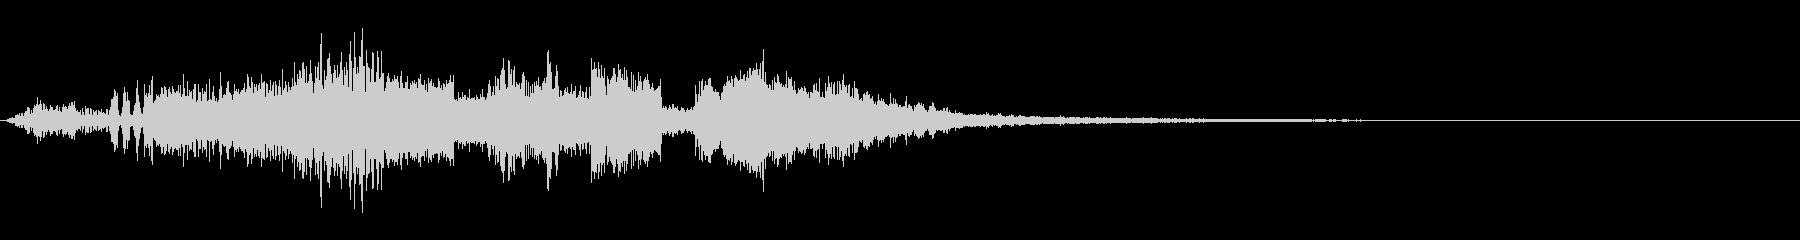 KANT近未来ロボット言語効果音5の未再生の波形